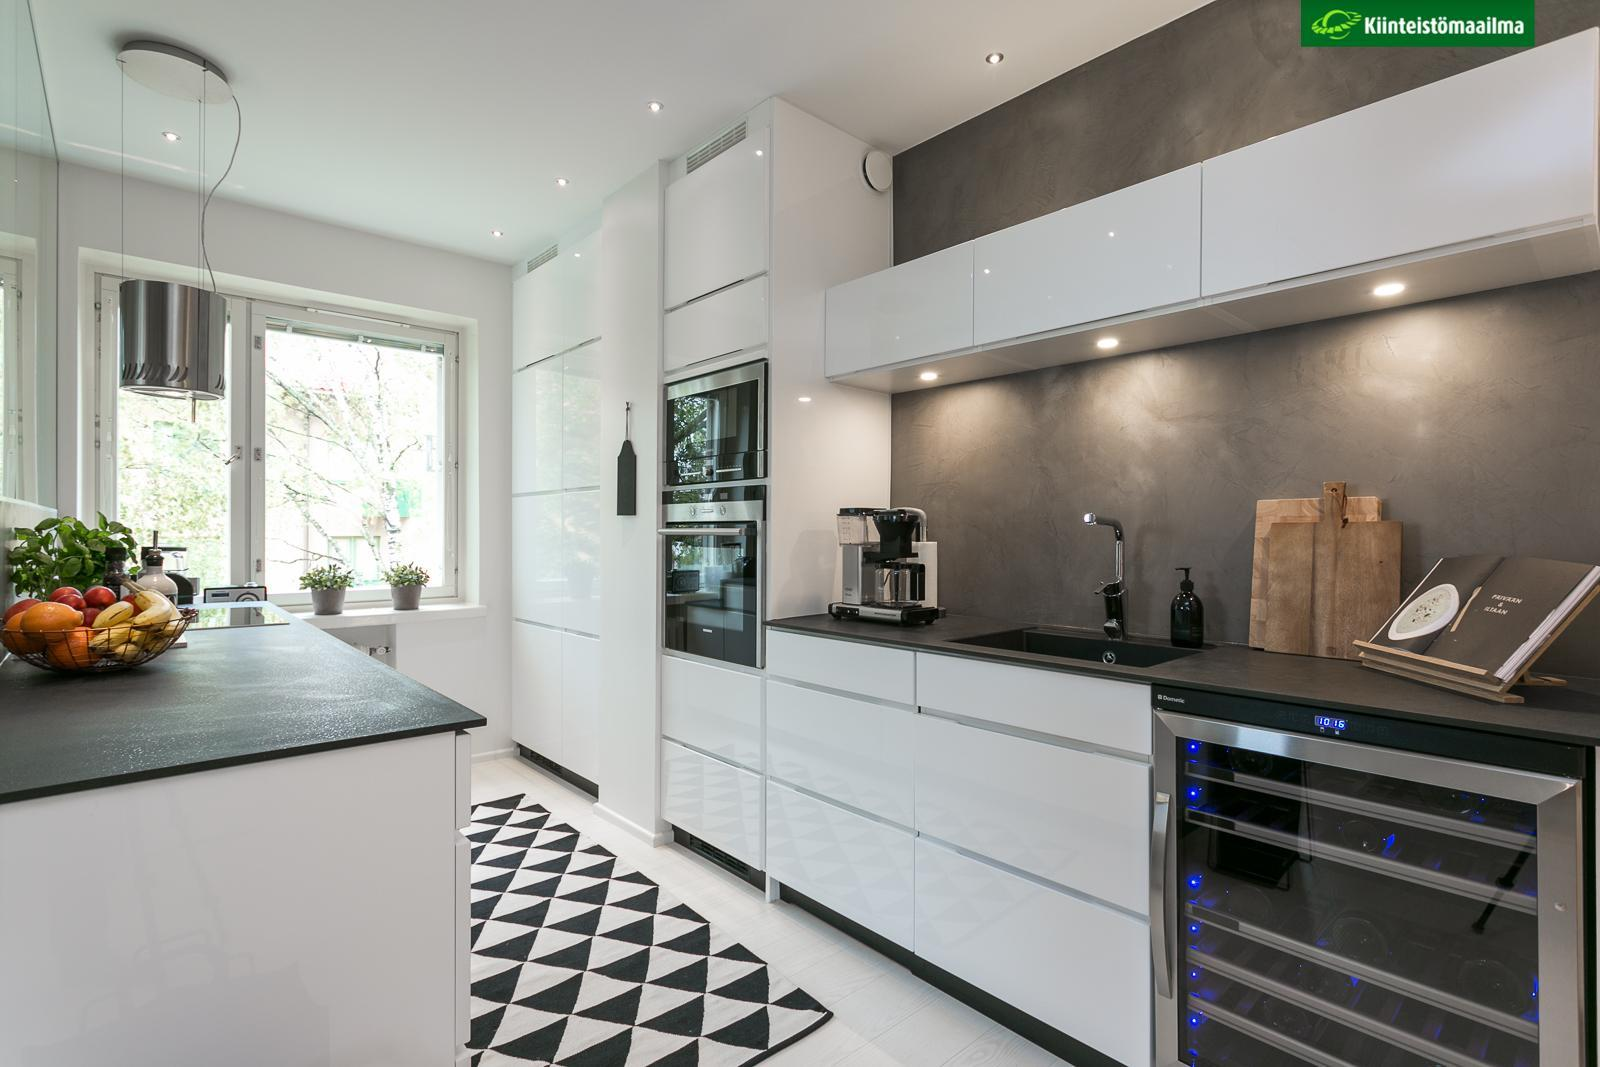 Kaksion moderni keittiö  Etuovi com Ideat & vinkit